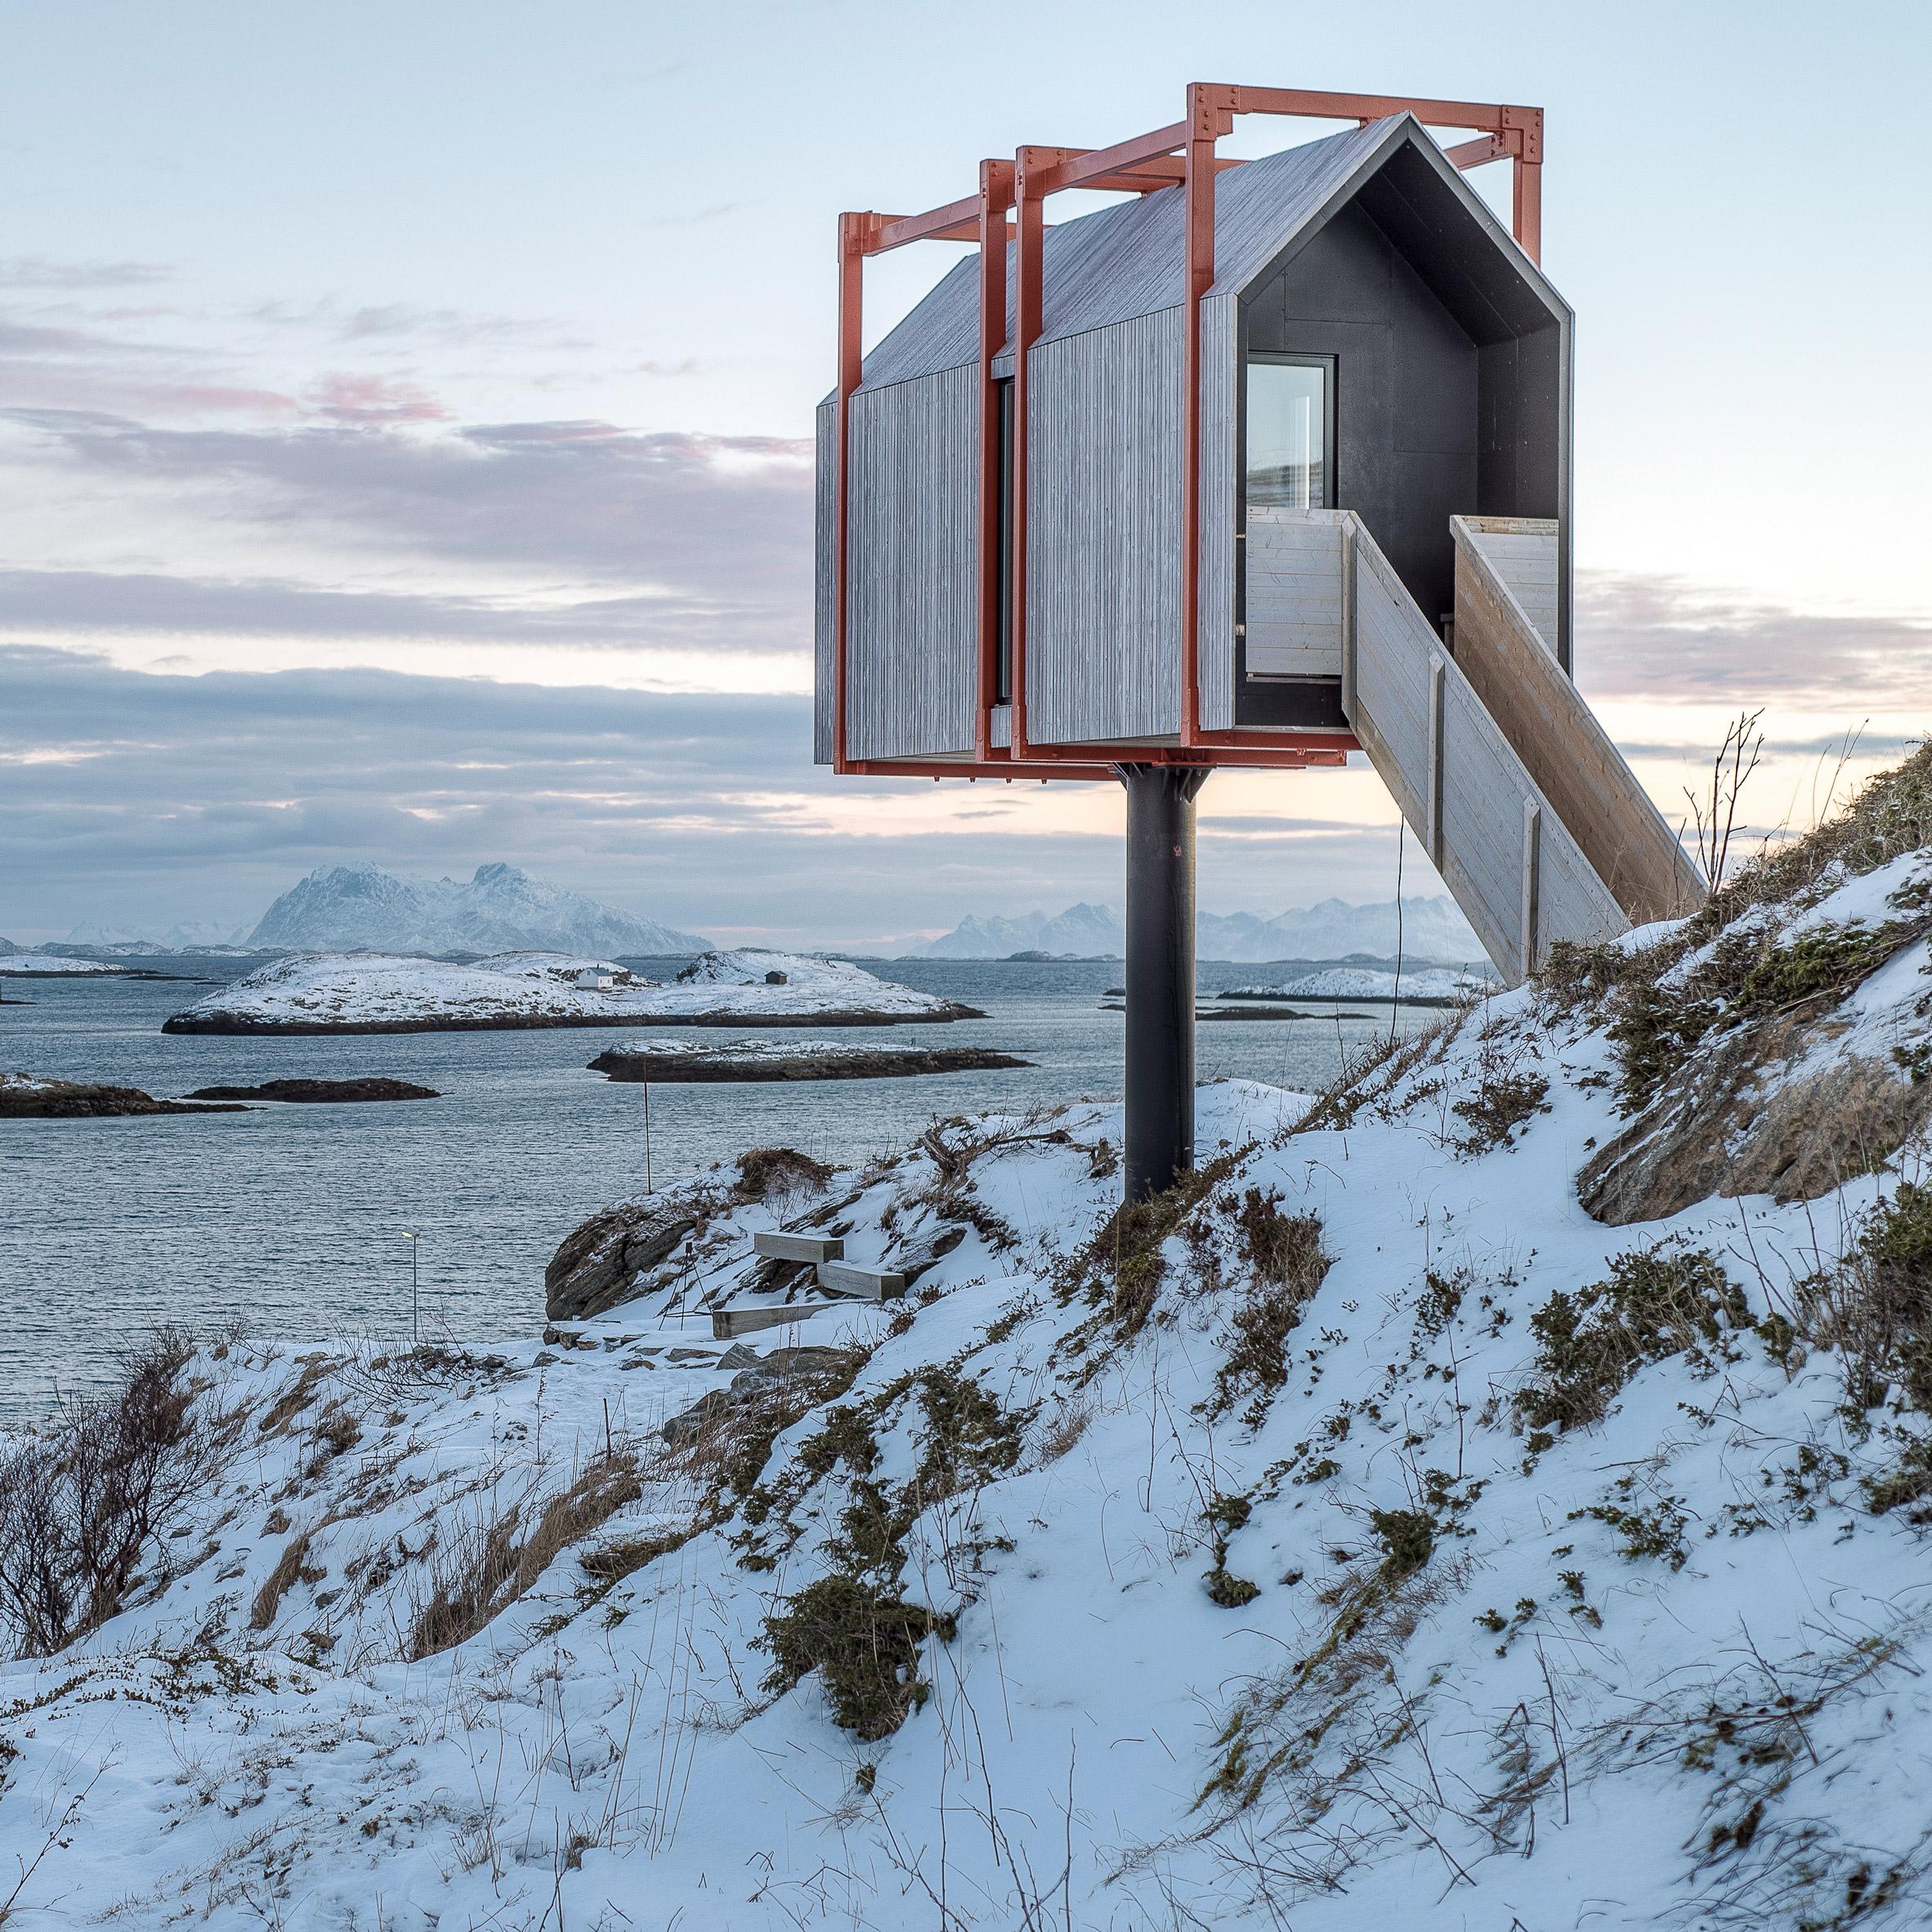 Urlaub Architektur's Holiday Architecture book roundup: Fordypningsrommet Fleinvær by TYIN Tegnestue Architects and Rental Eggertsson Architects